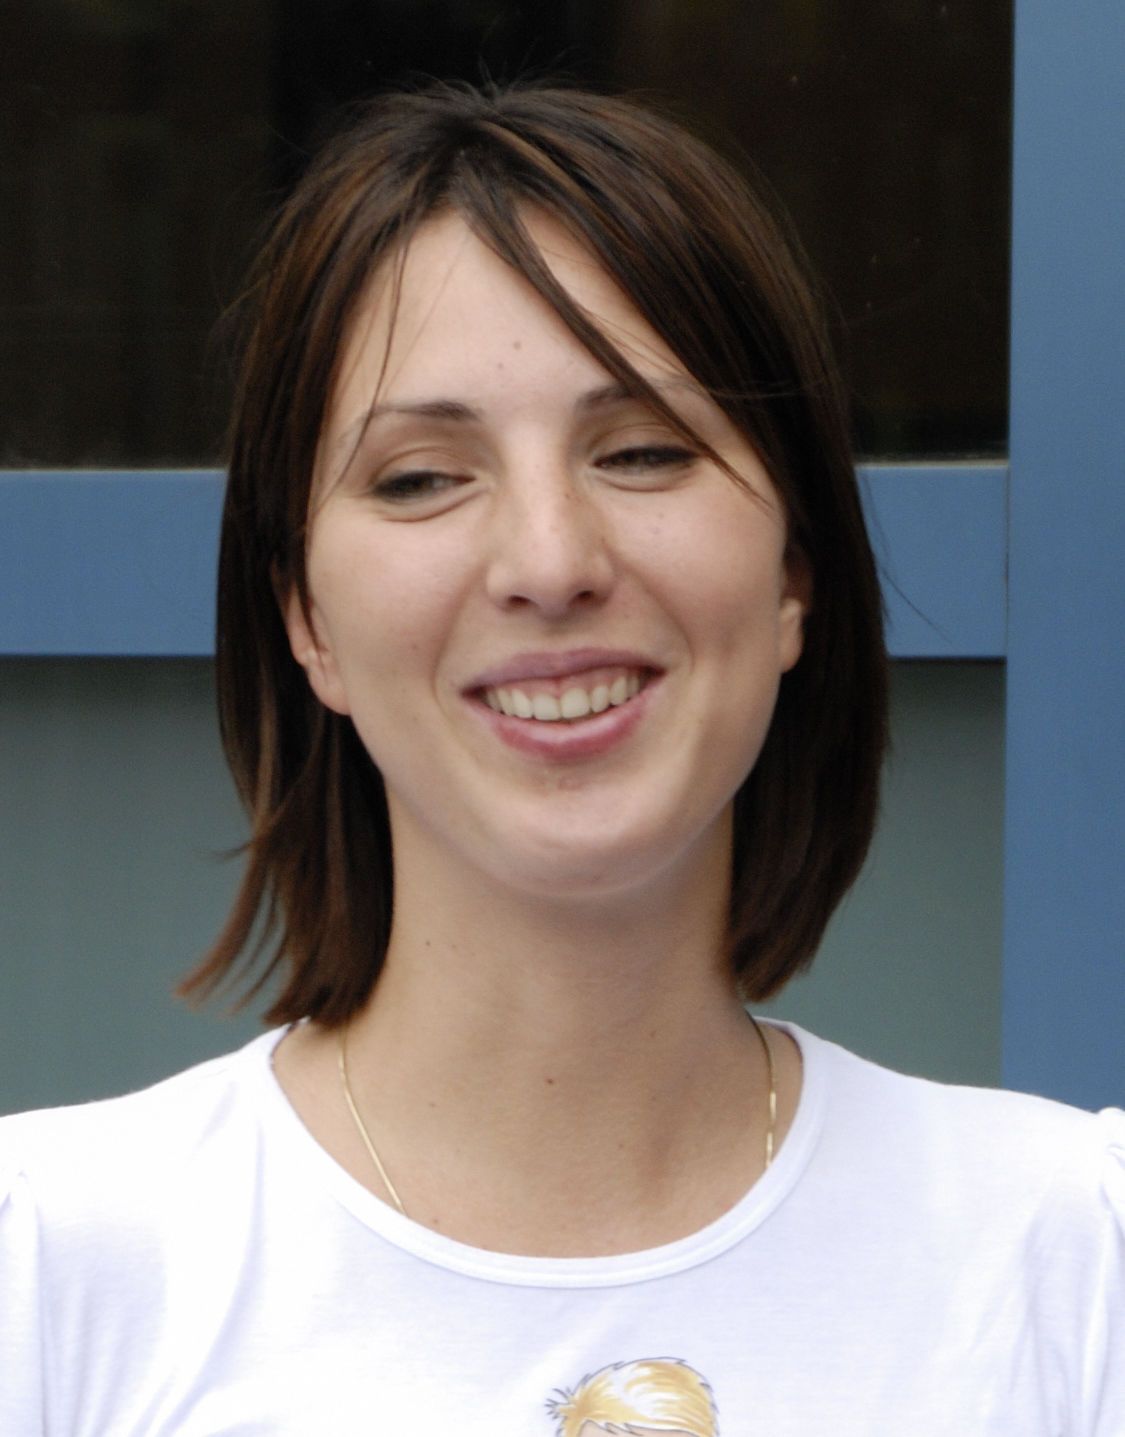 Photo of Anastasia Myskina: Russian tennis player